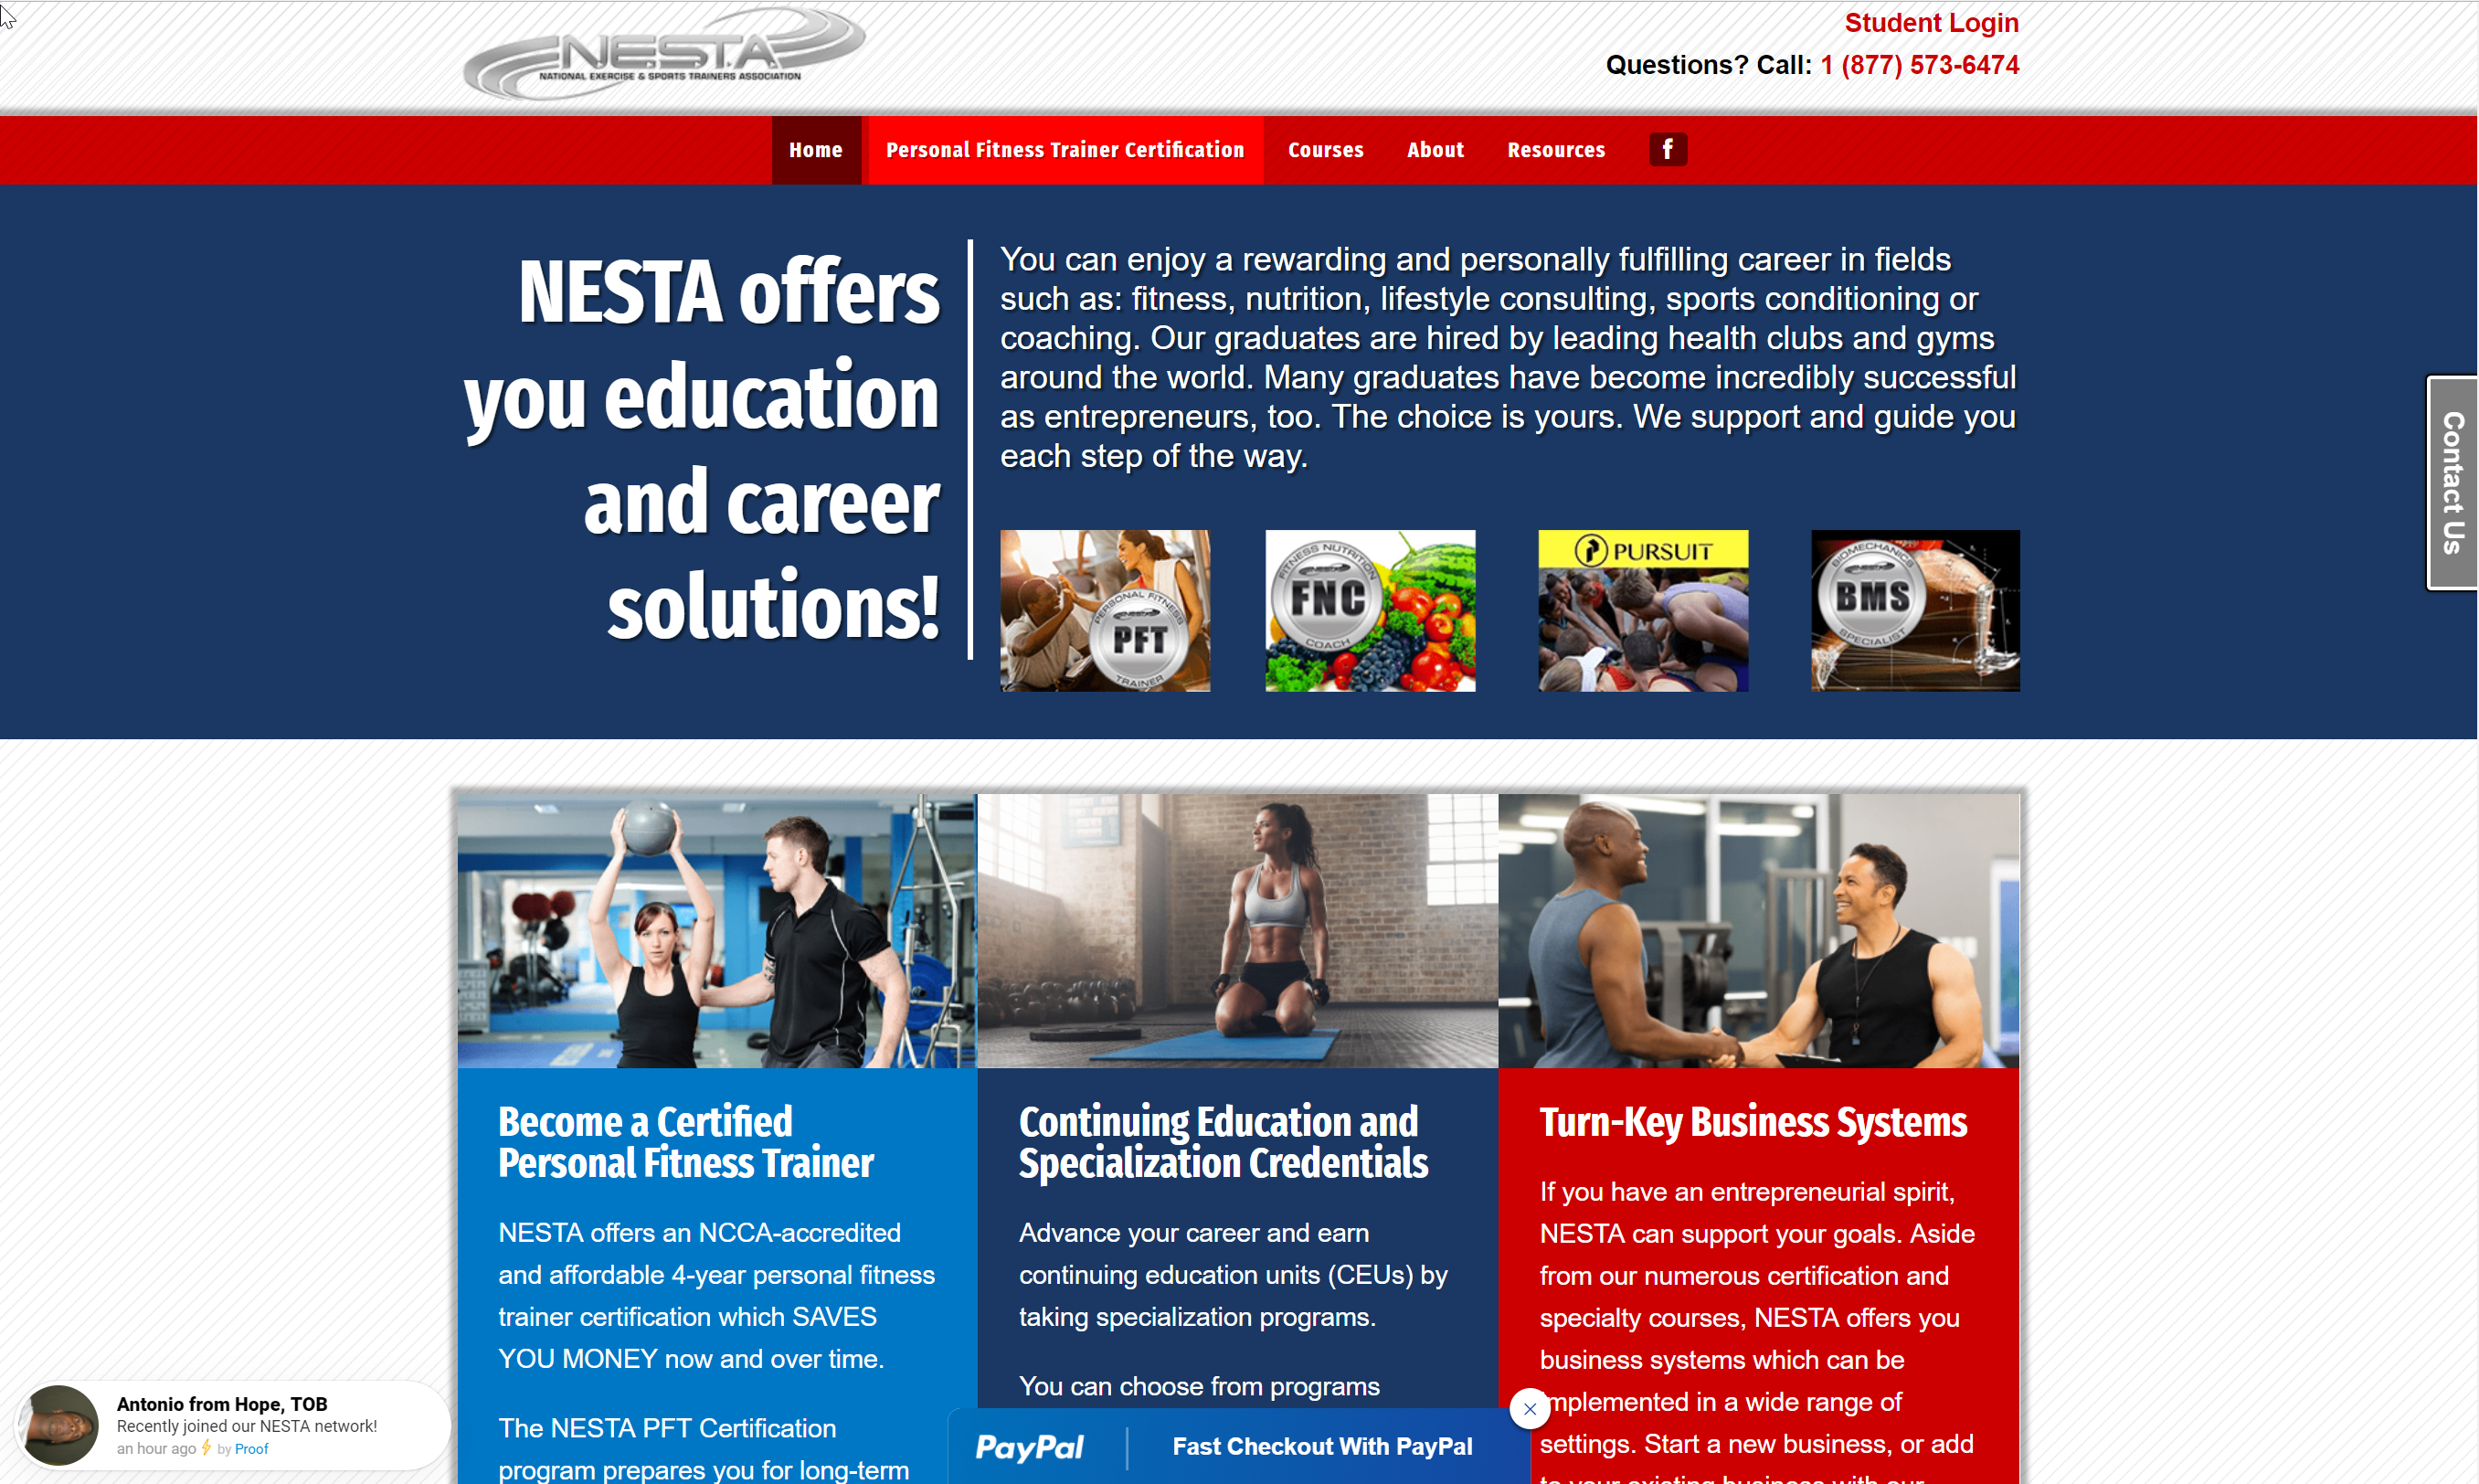 NESTA website